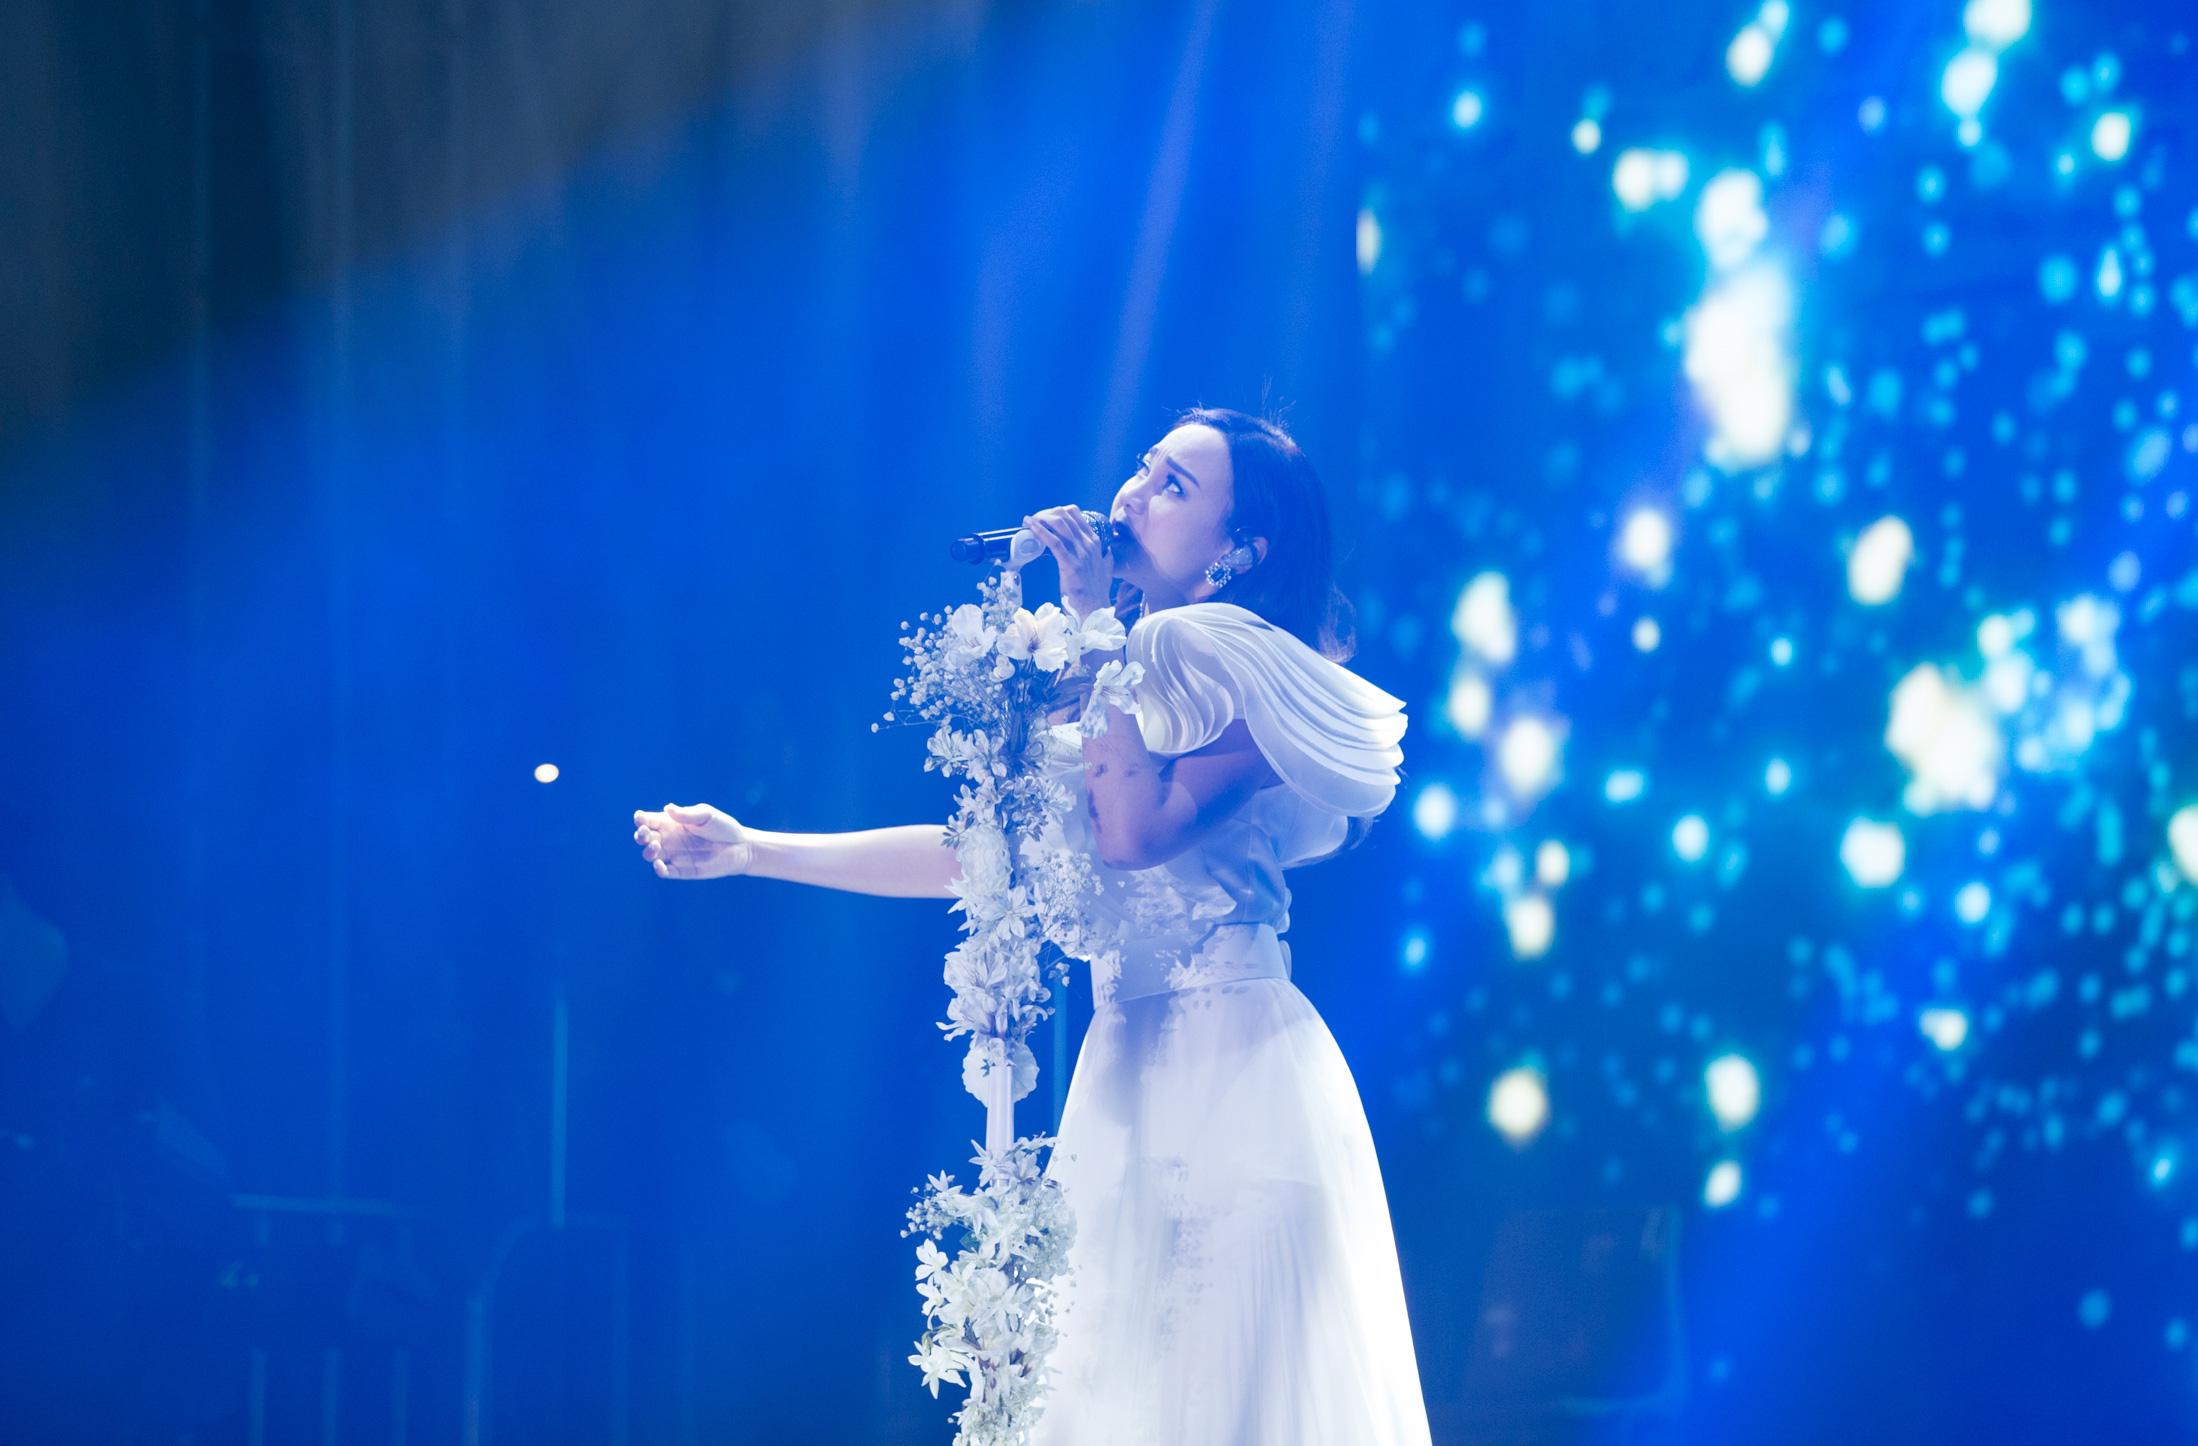 AGA首次廣州開唱全場爆滿 邀GinLee任嘉賓: 慶幸遇到這好友!